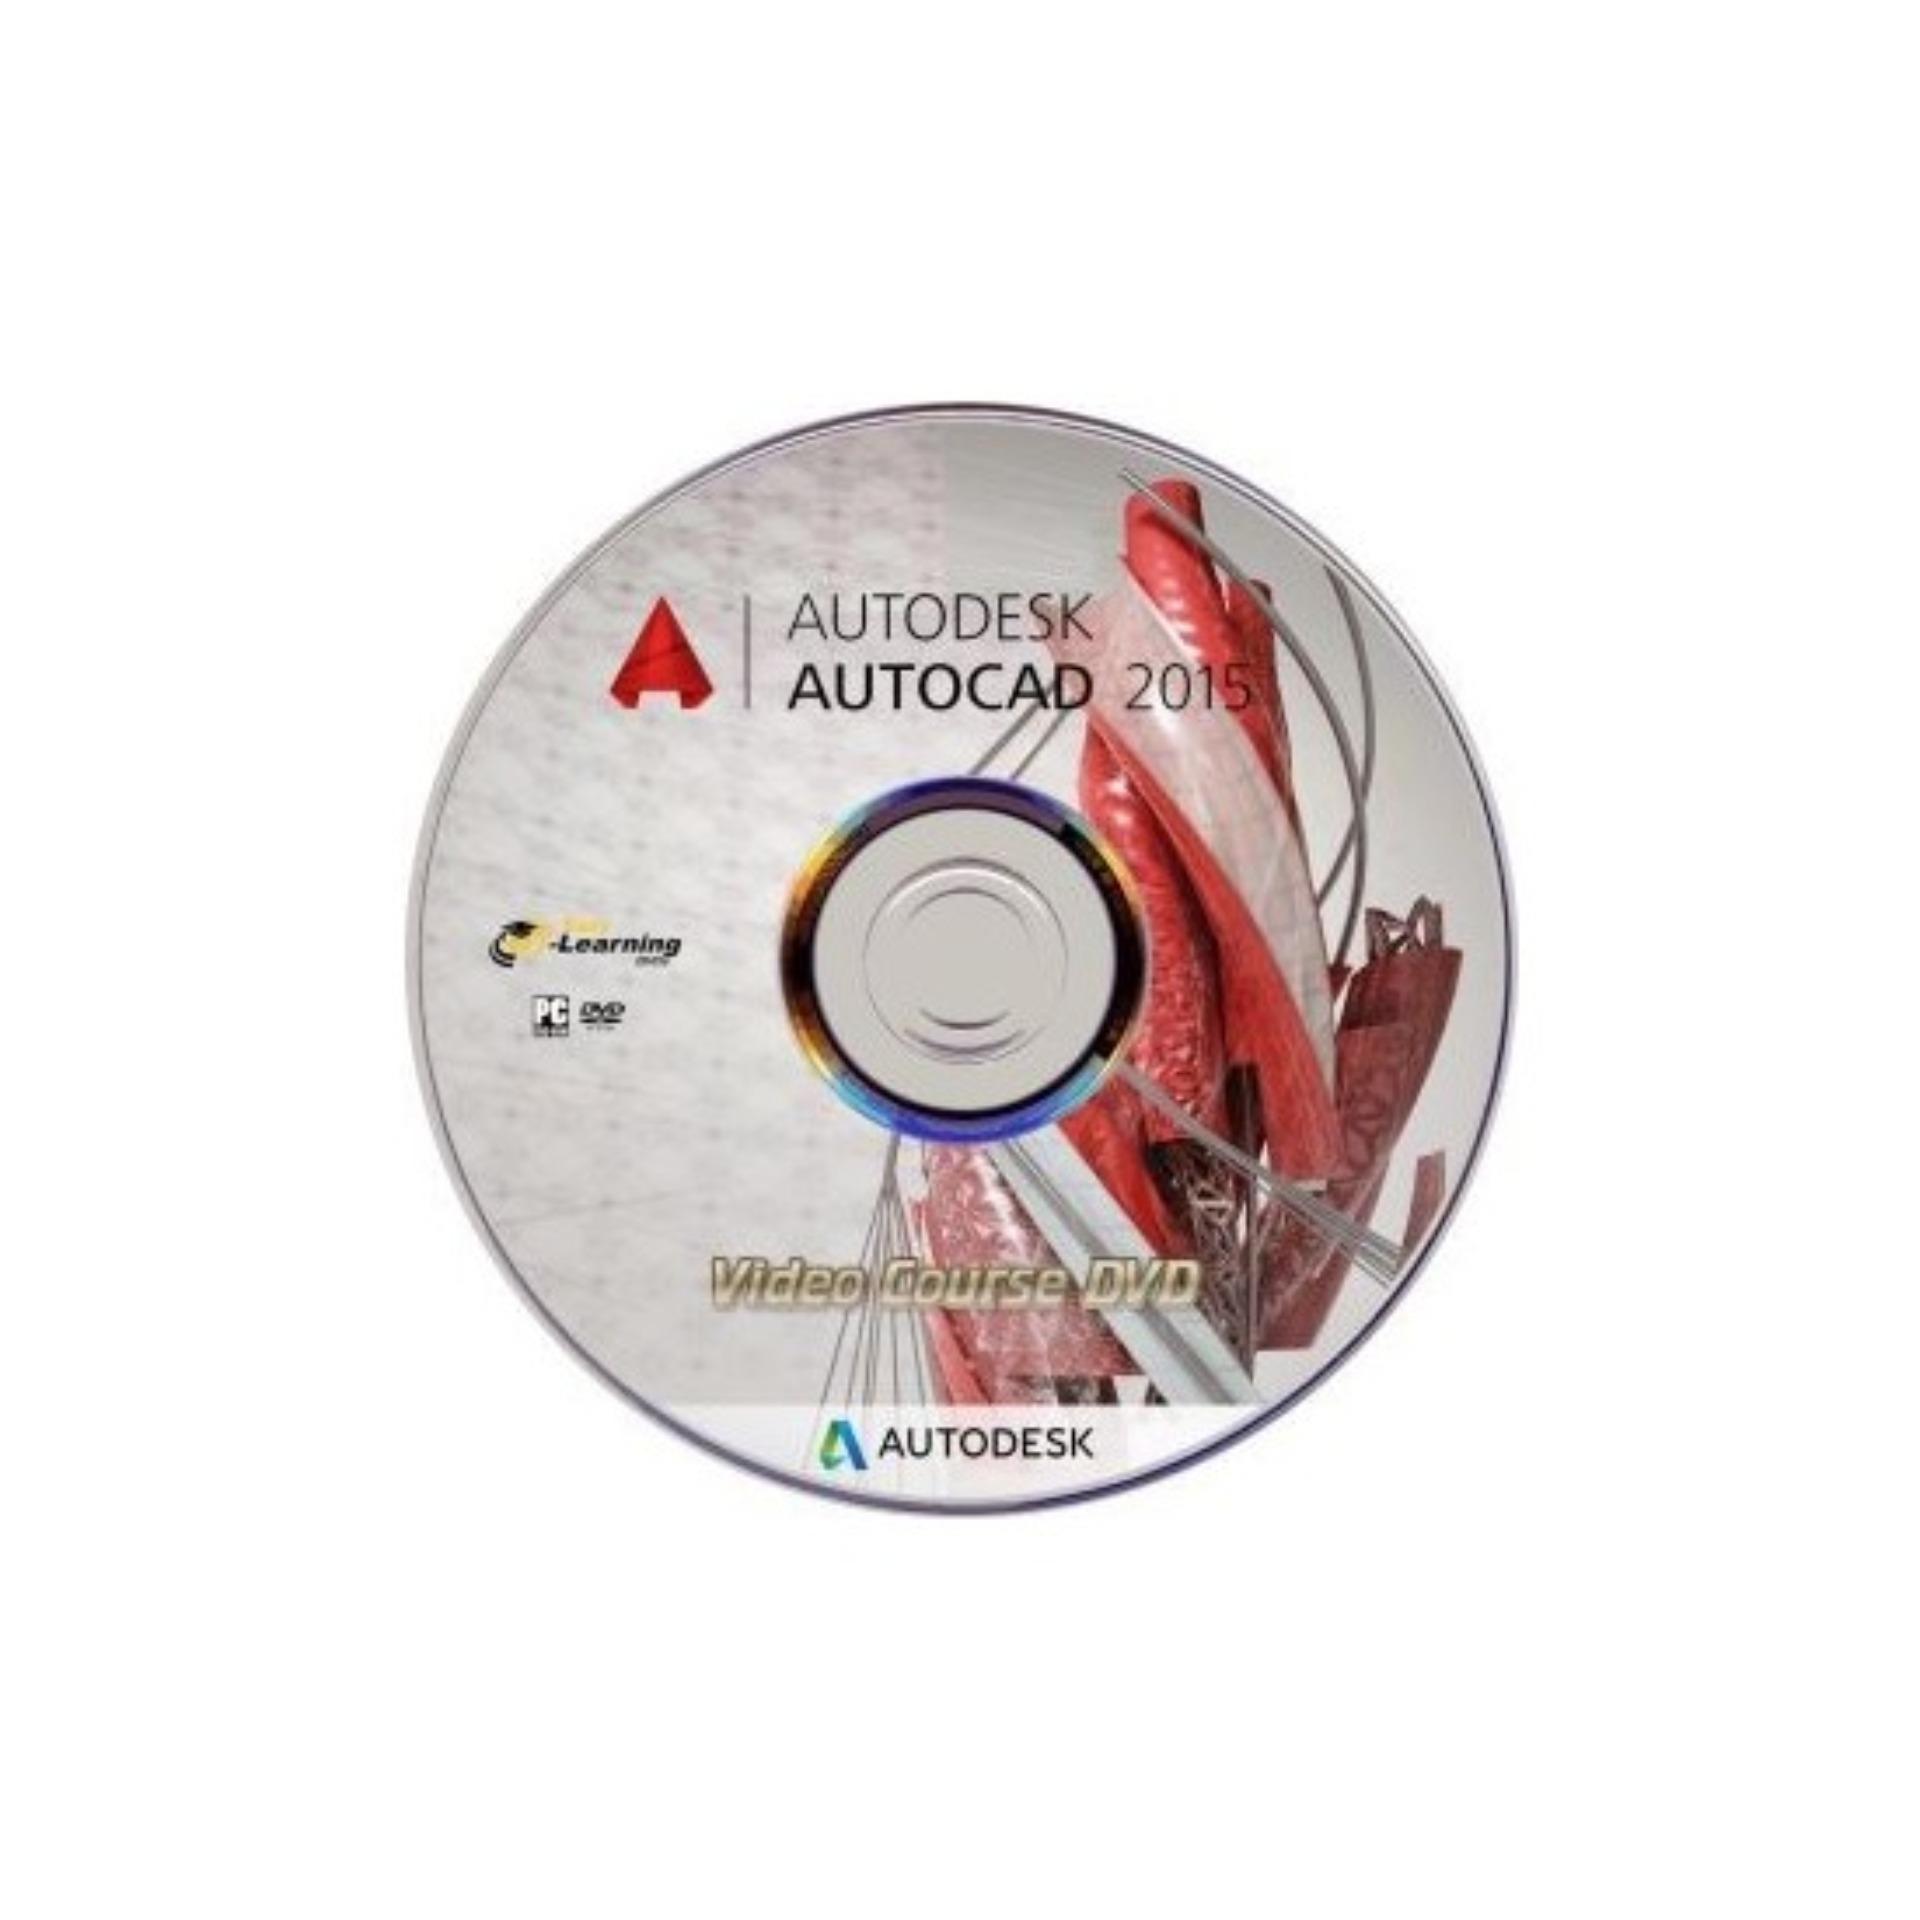 Hình ảnh Bộ Đĩa AUTOCAD 2007 - 2015 - 2017 (full crack) Autocad 2015 64bit